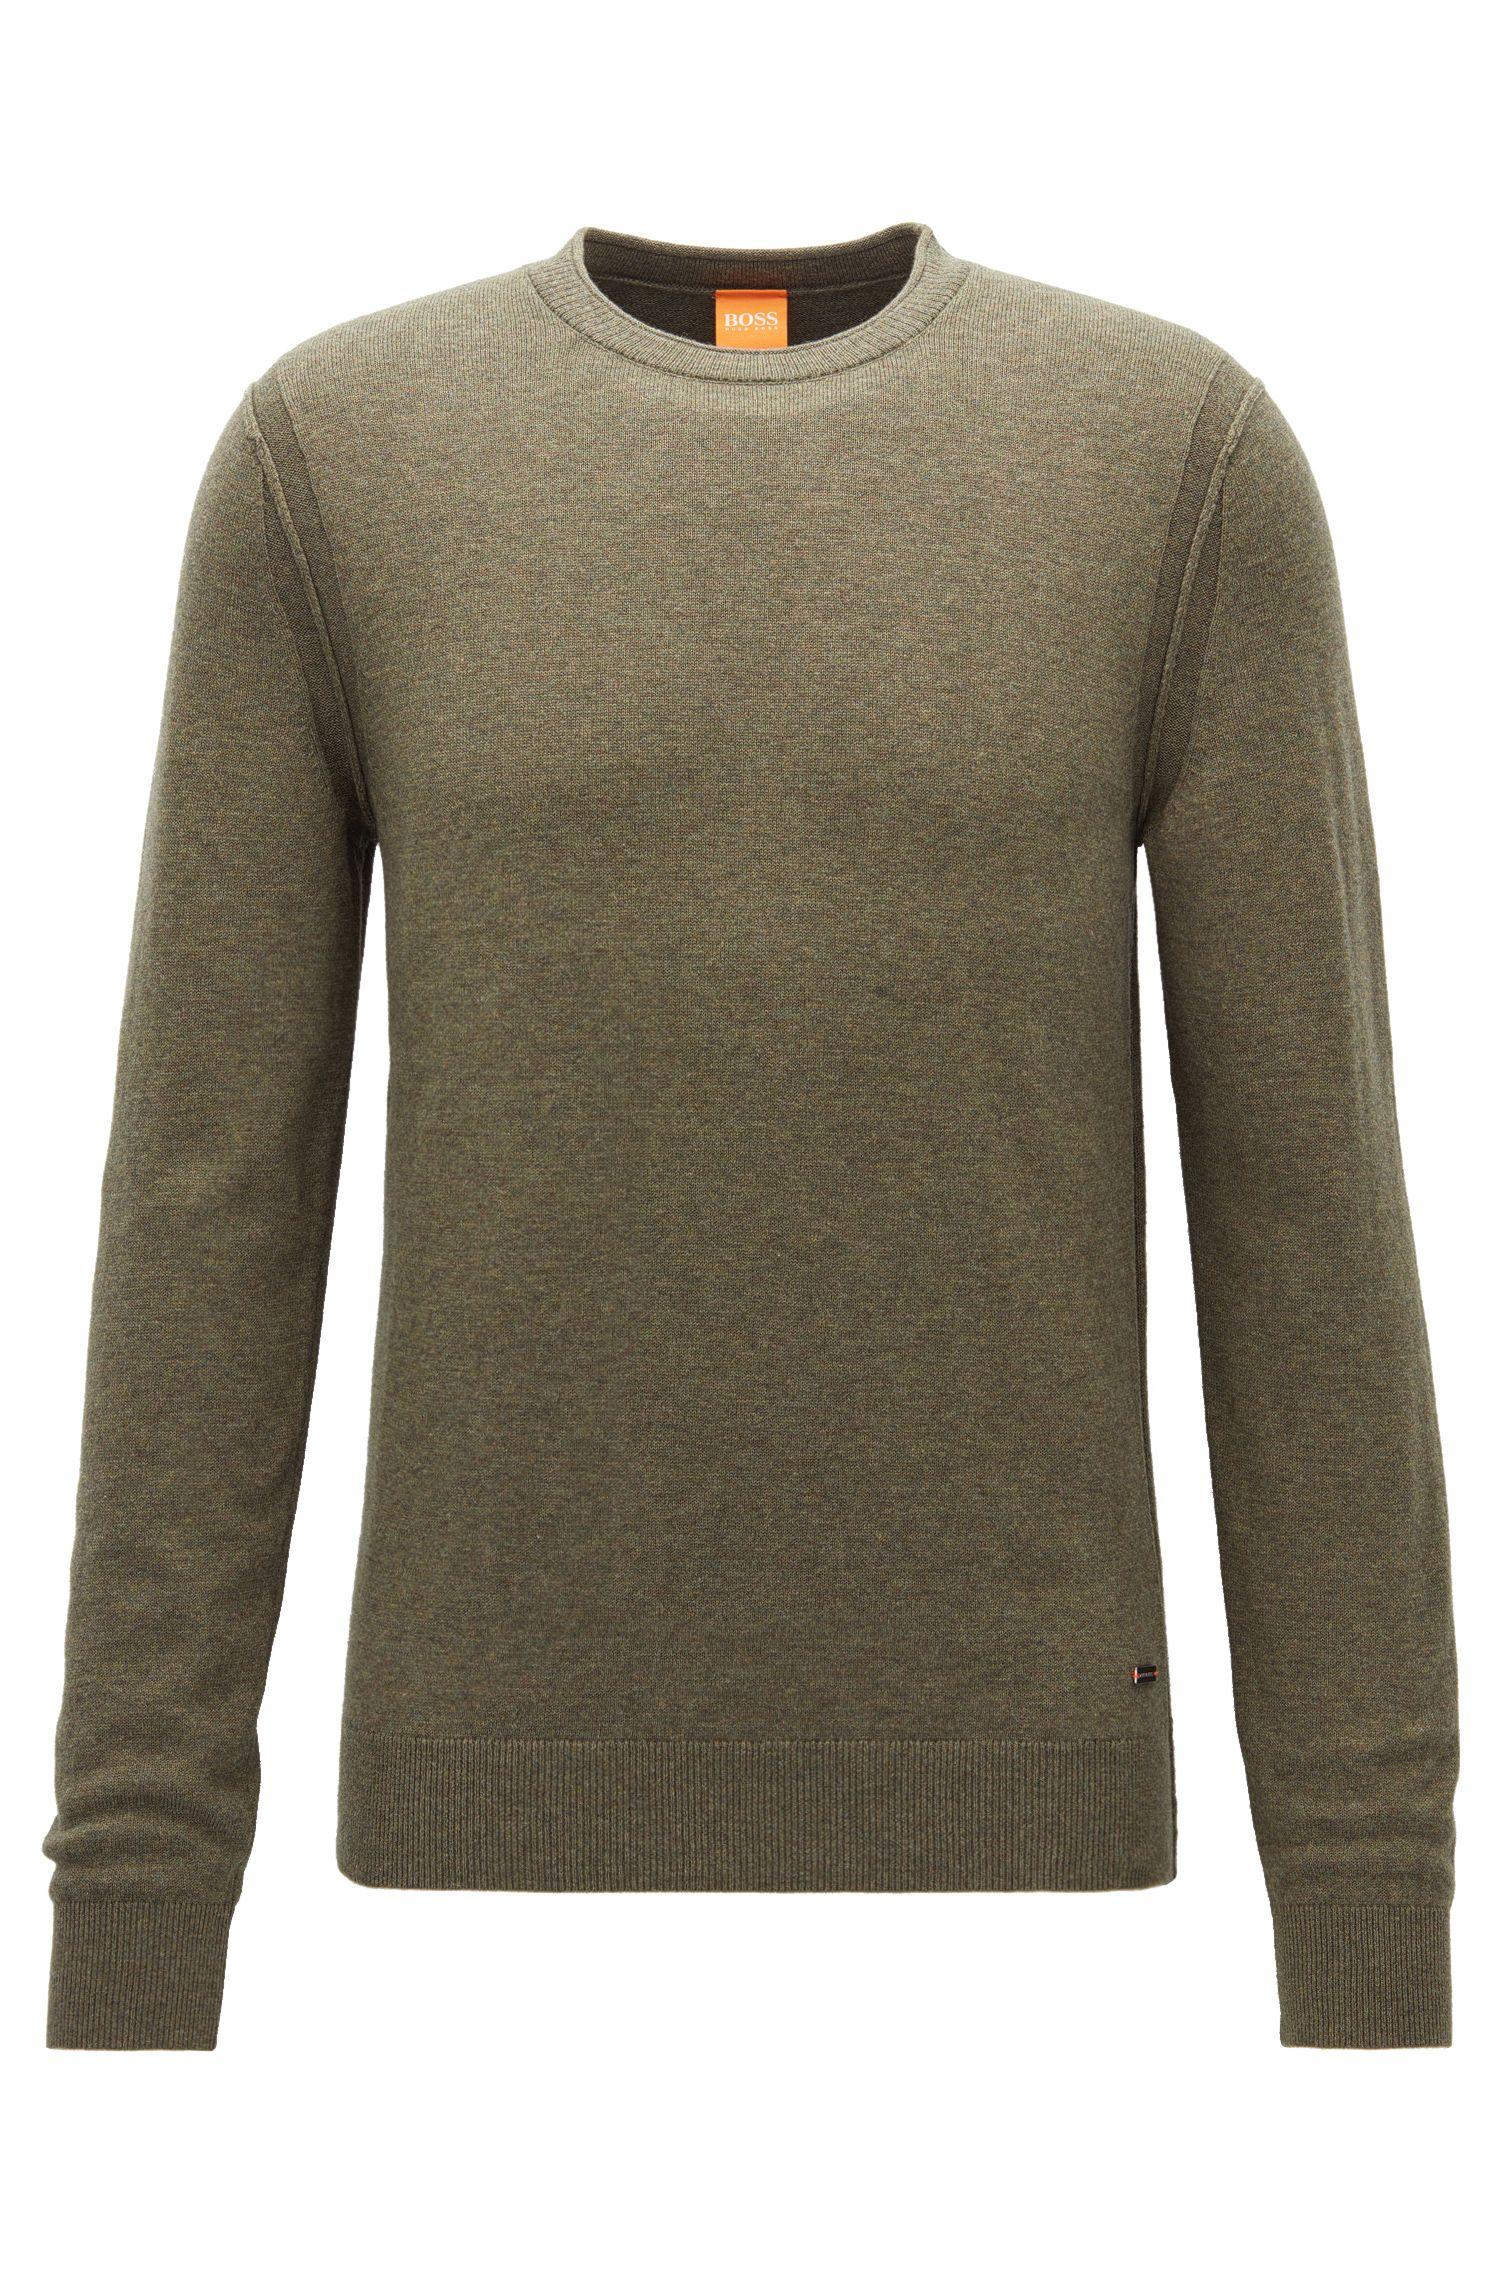 'Albonon' | Cotton-Virgin Wool Blend Sweater